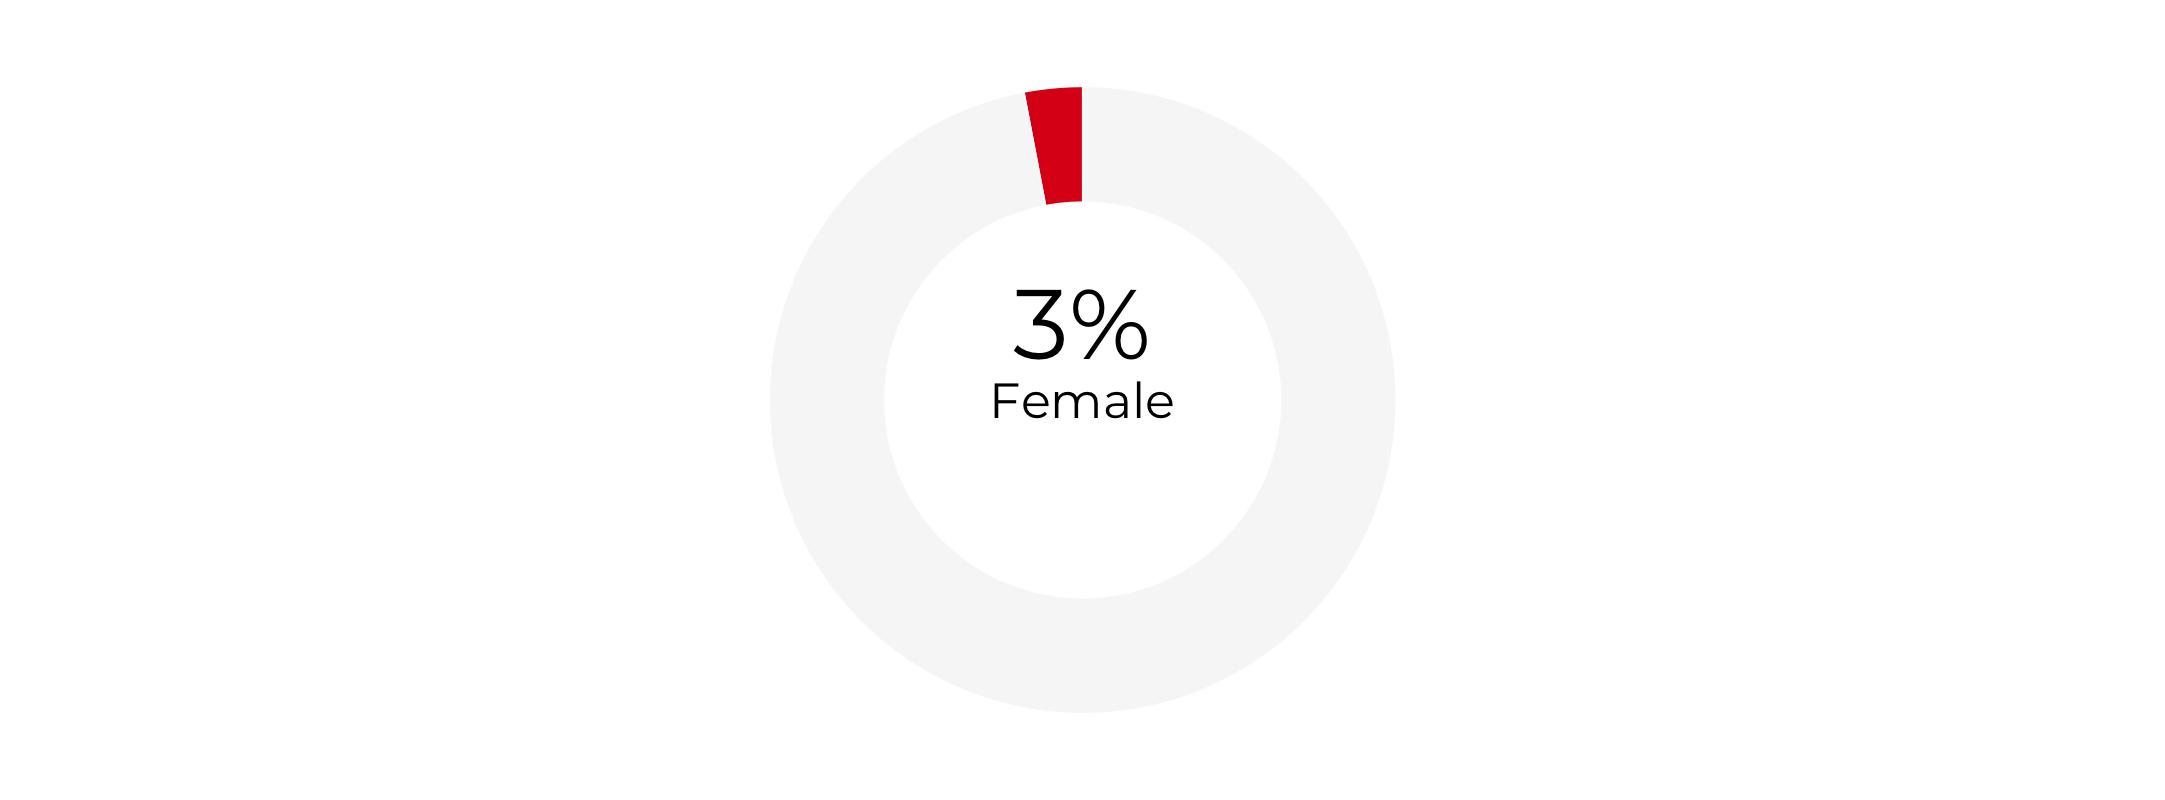 Graph about Gender Composition of Deputy Secretaries of Labor. More detailed text description below.